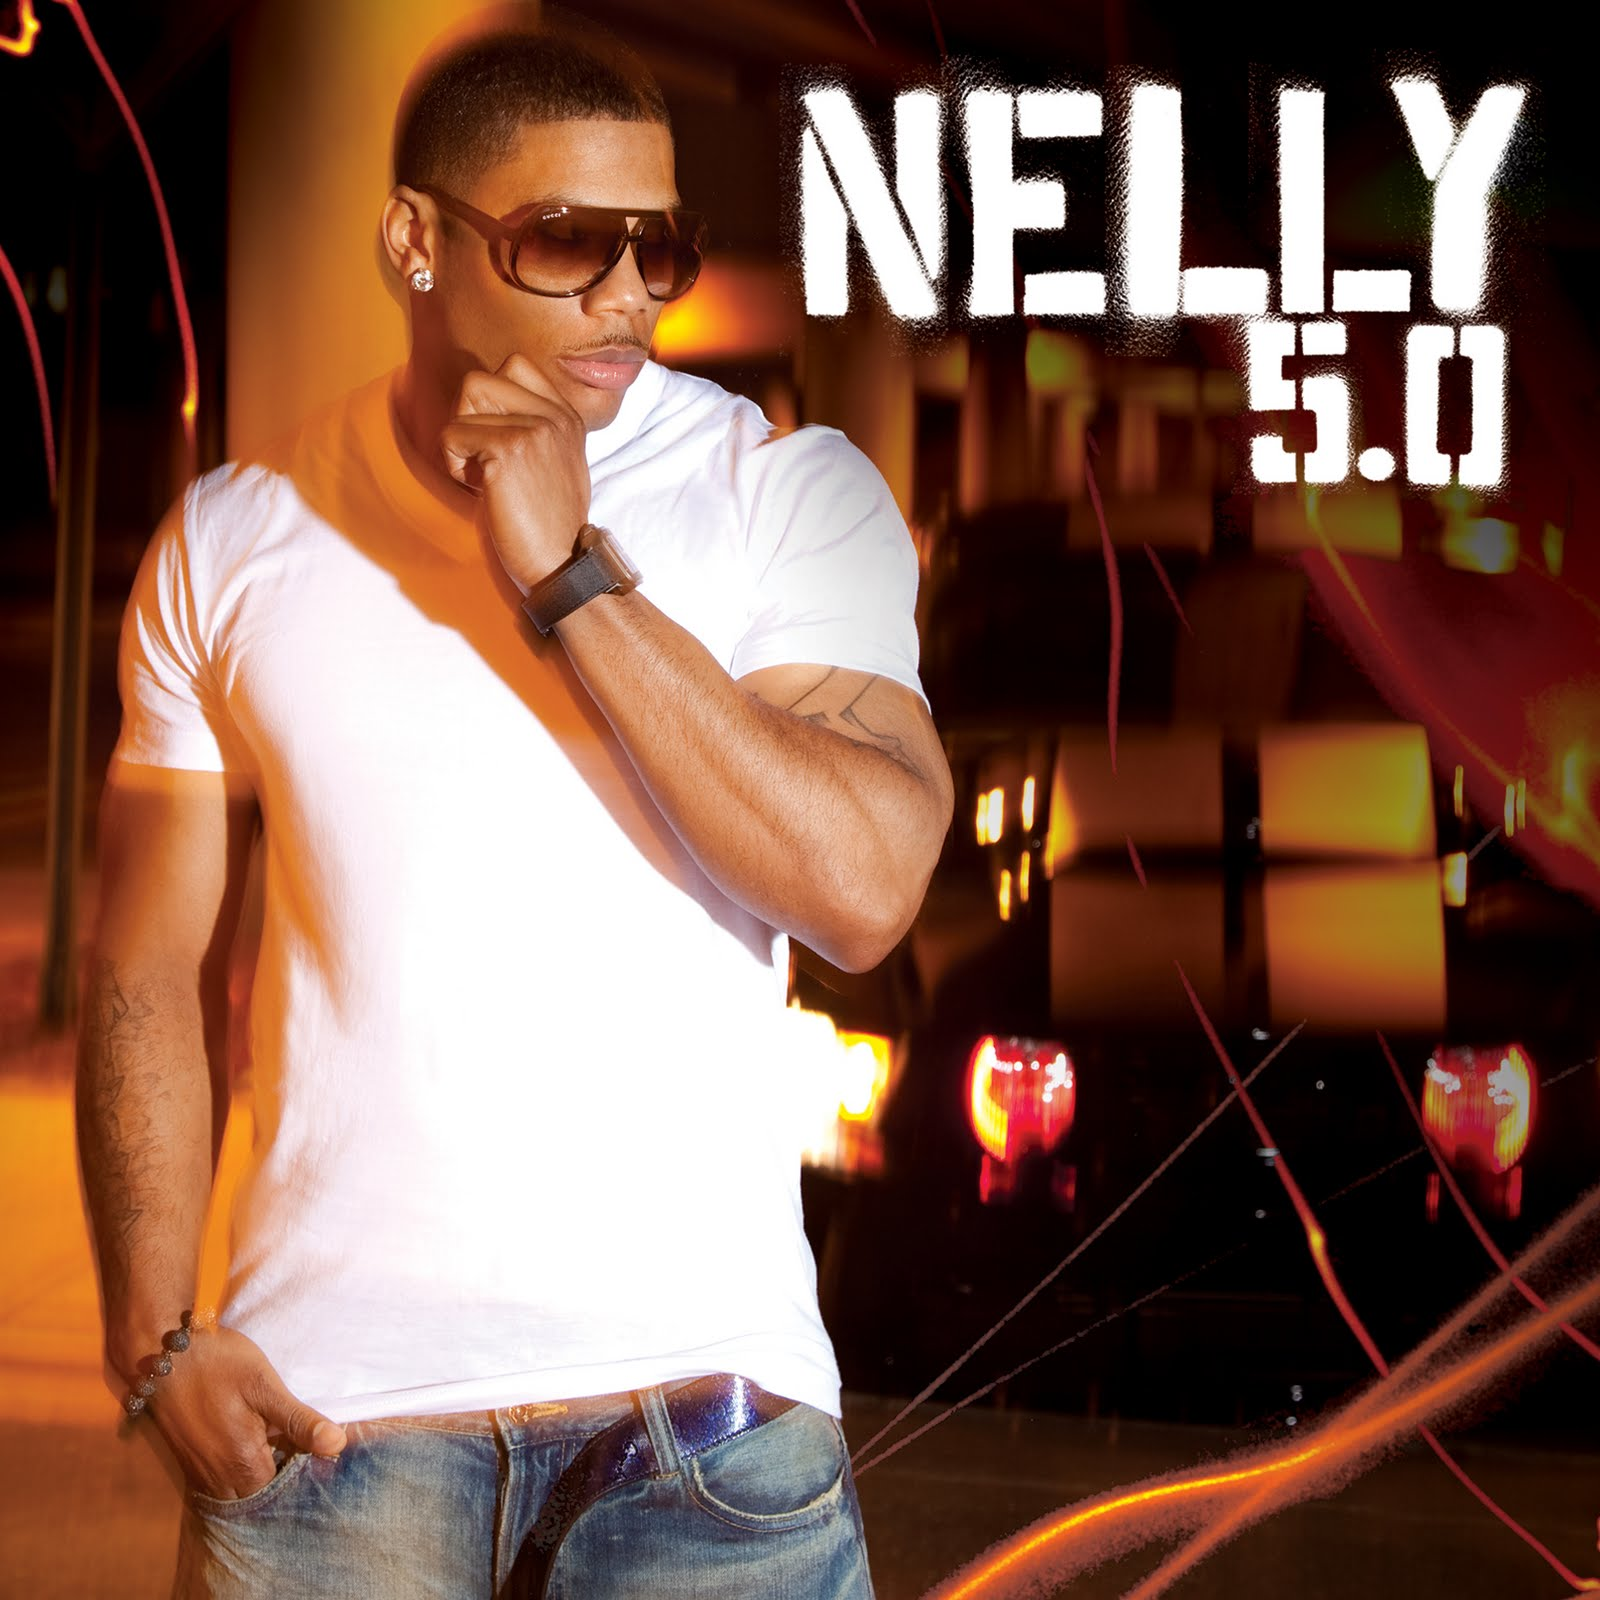 http://3.bp.blogspot.com/_KDvzKXcML4E/TOClKfRzdUI/AAAAAAAAD3o/zrYIK35jY7c/s1600/Nelly-5.0-album-cover.jpg